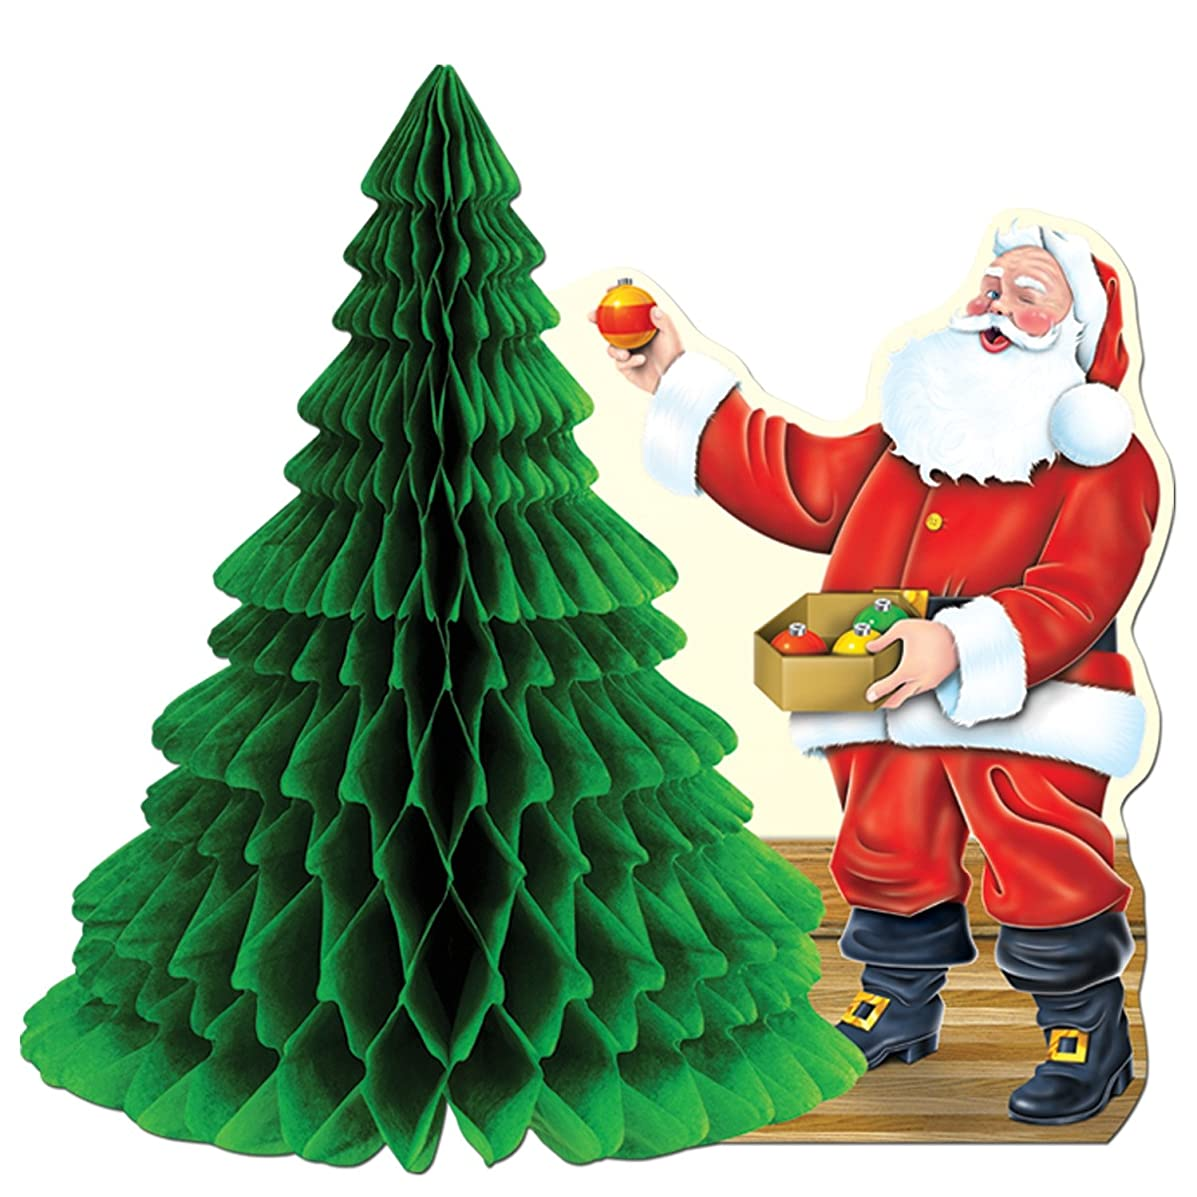 Santa w/Tissue Tree Centerpiece Party Accessory (1 count) (1/Pkg)